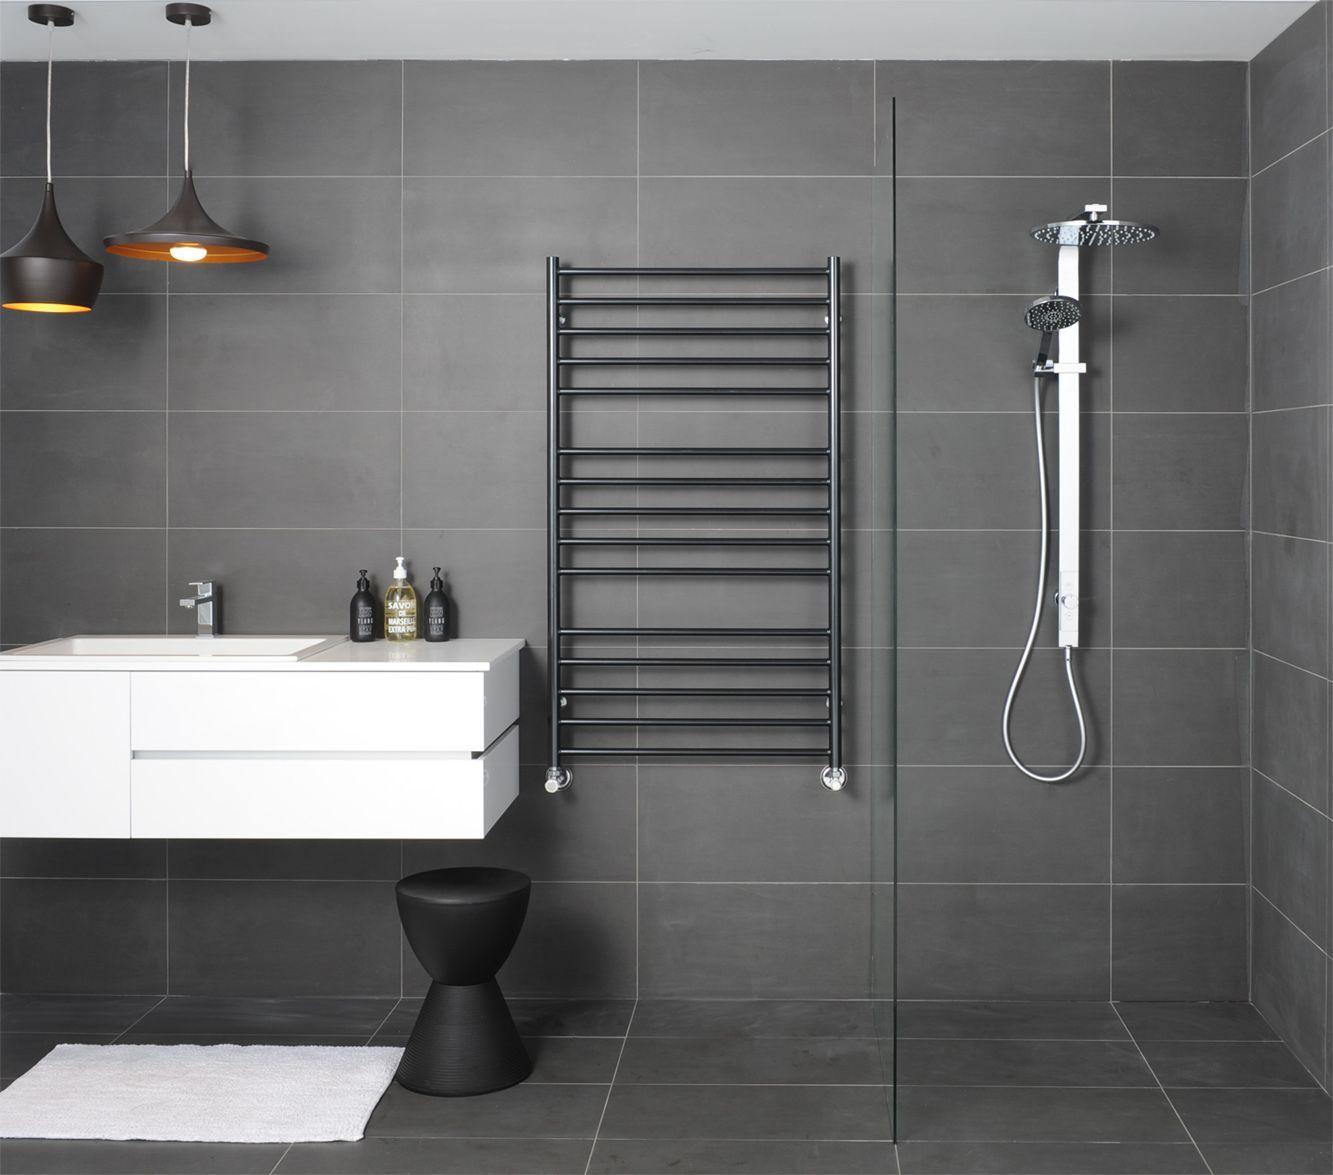 heated bathroom tiles. Bathroom With Black Slate Tiles And Heated Towel Rail Also Hanging Pendants L